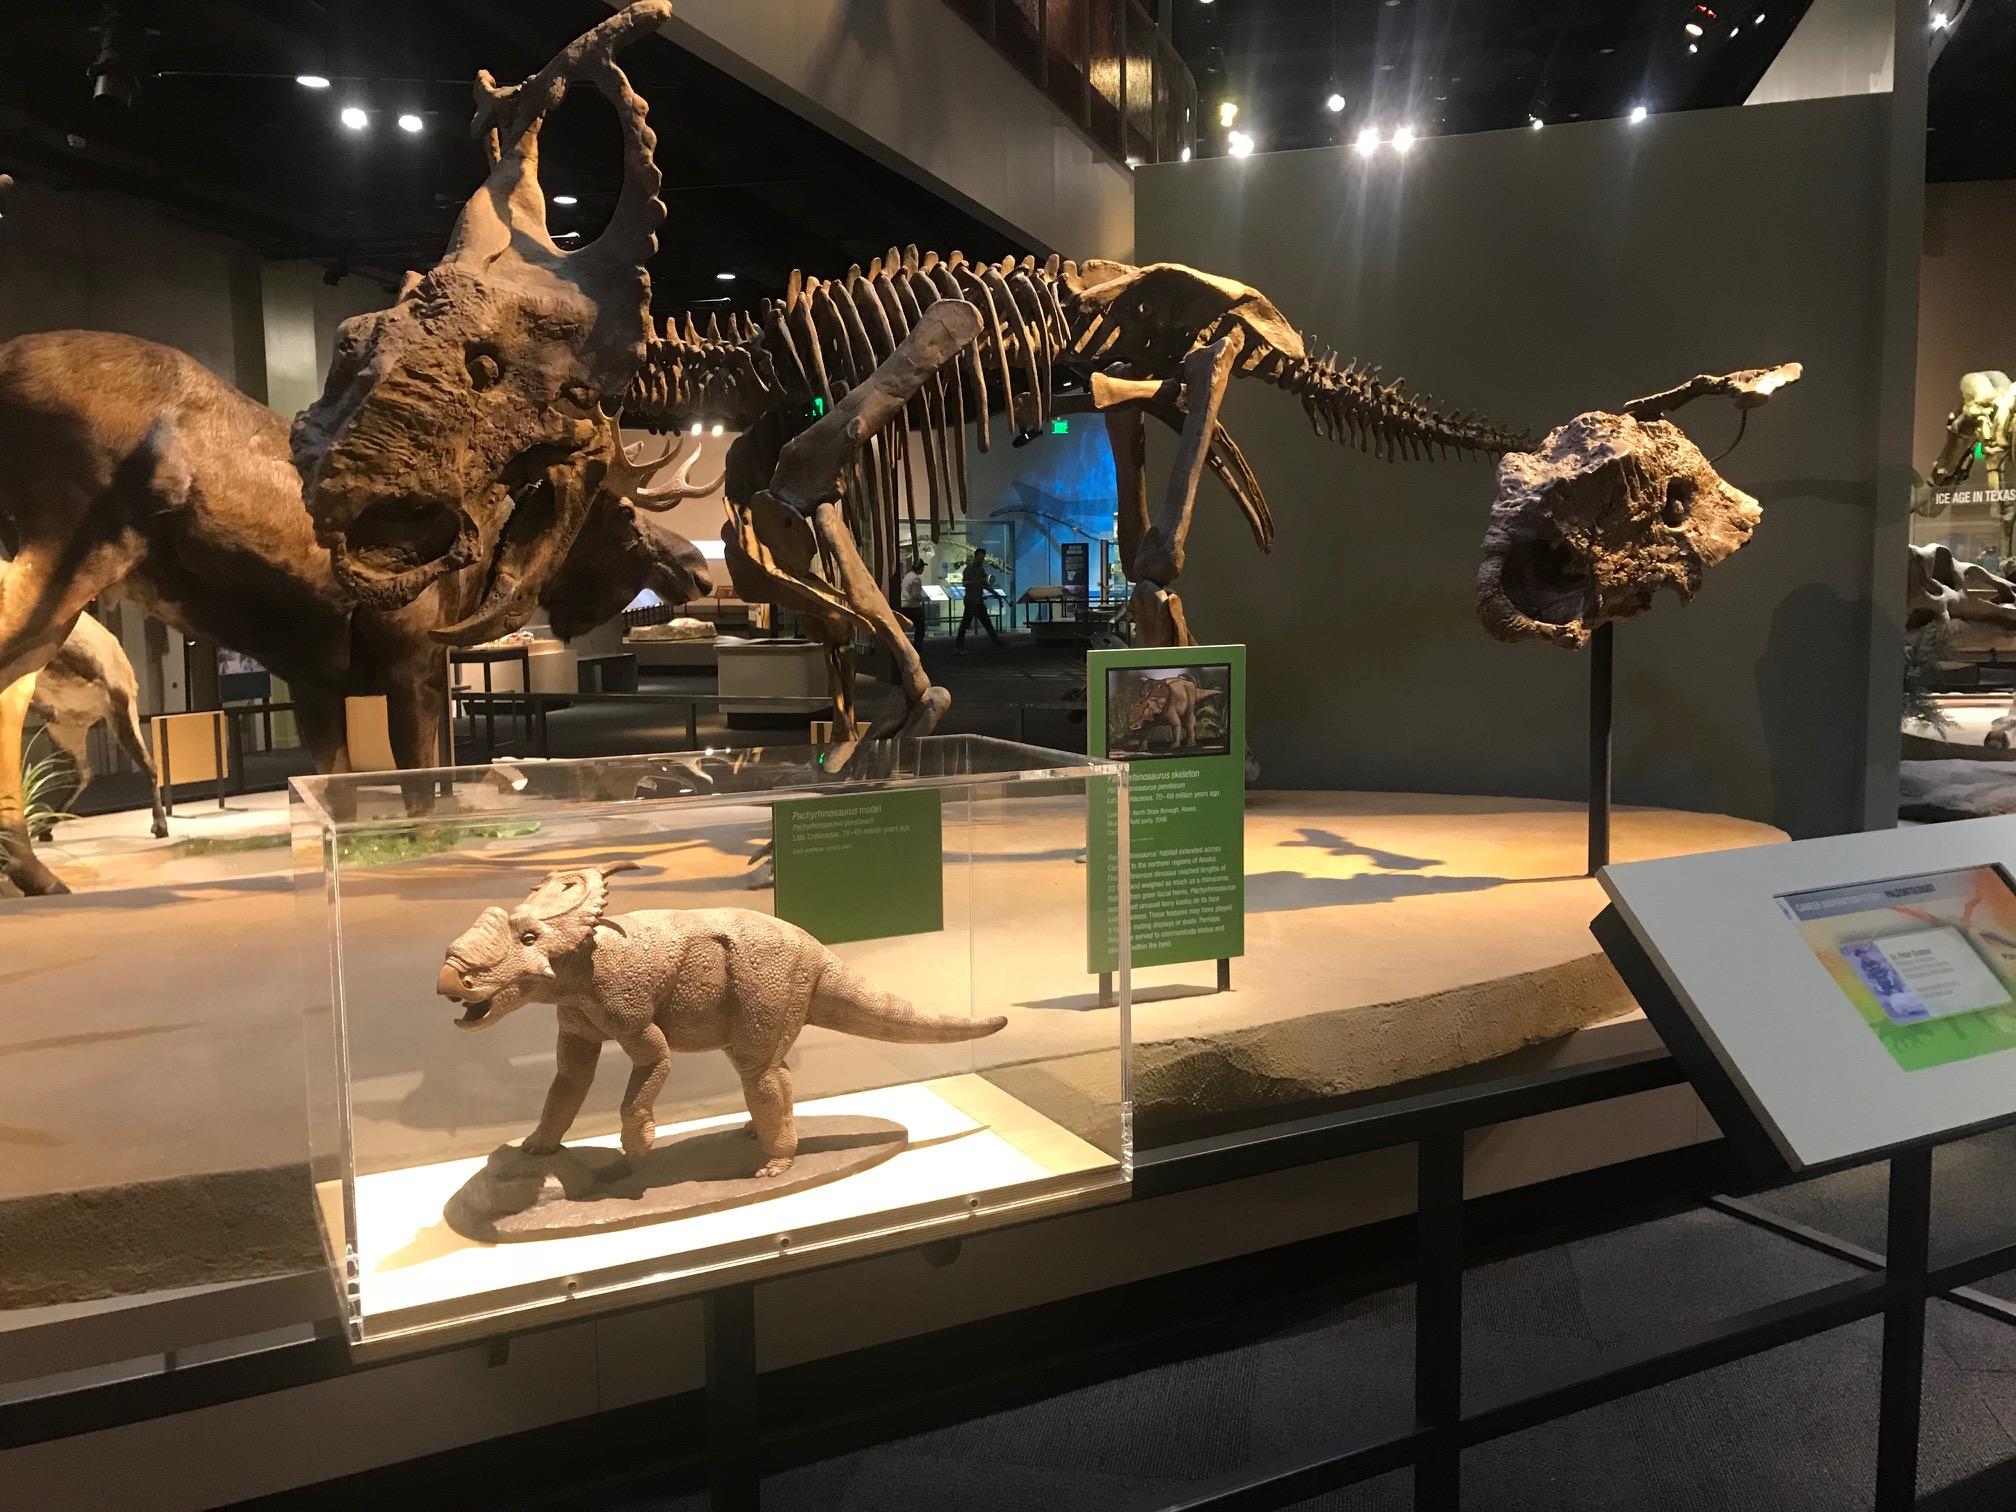 Pachyrhinosaurus perotorum Snapchat AR Lens Perot Museum